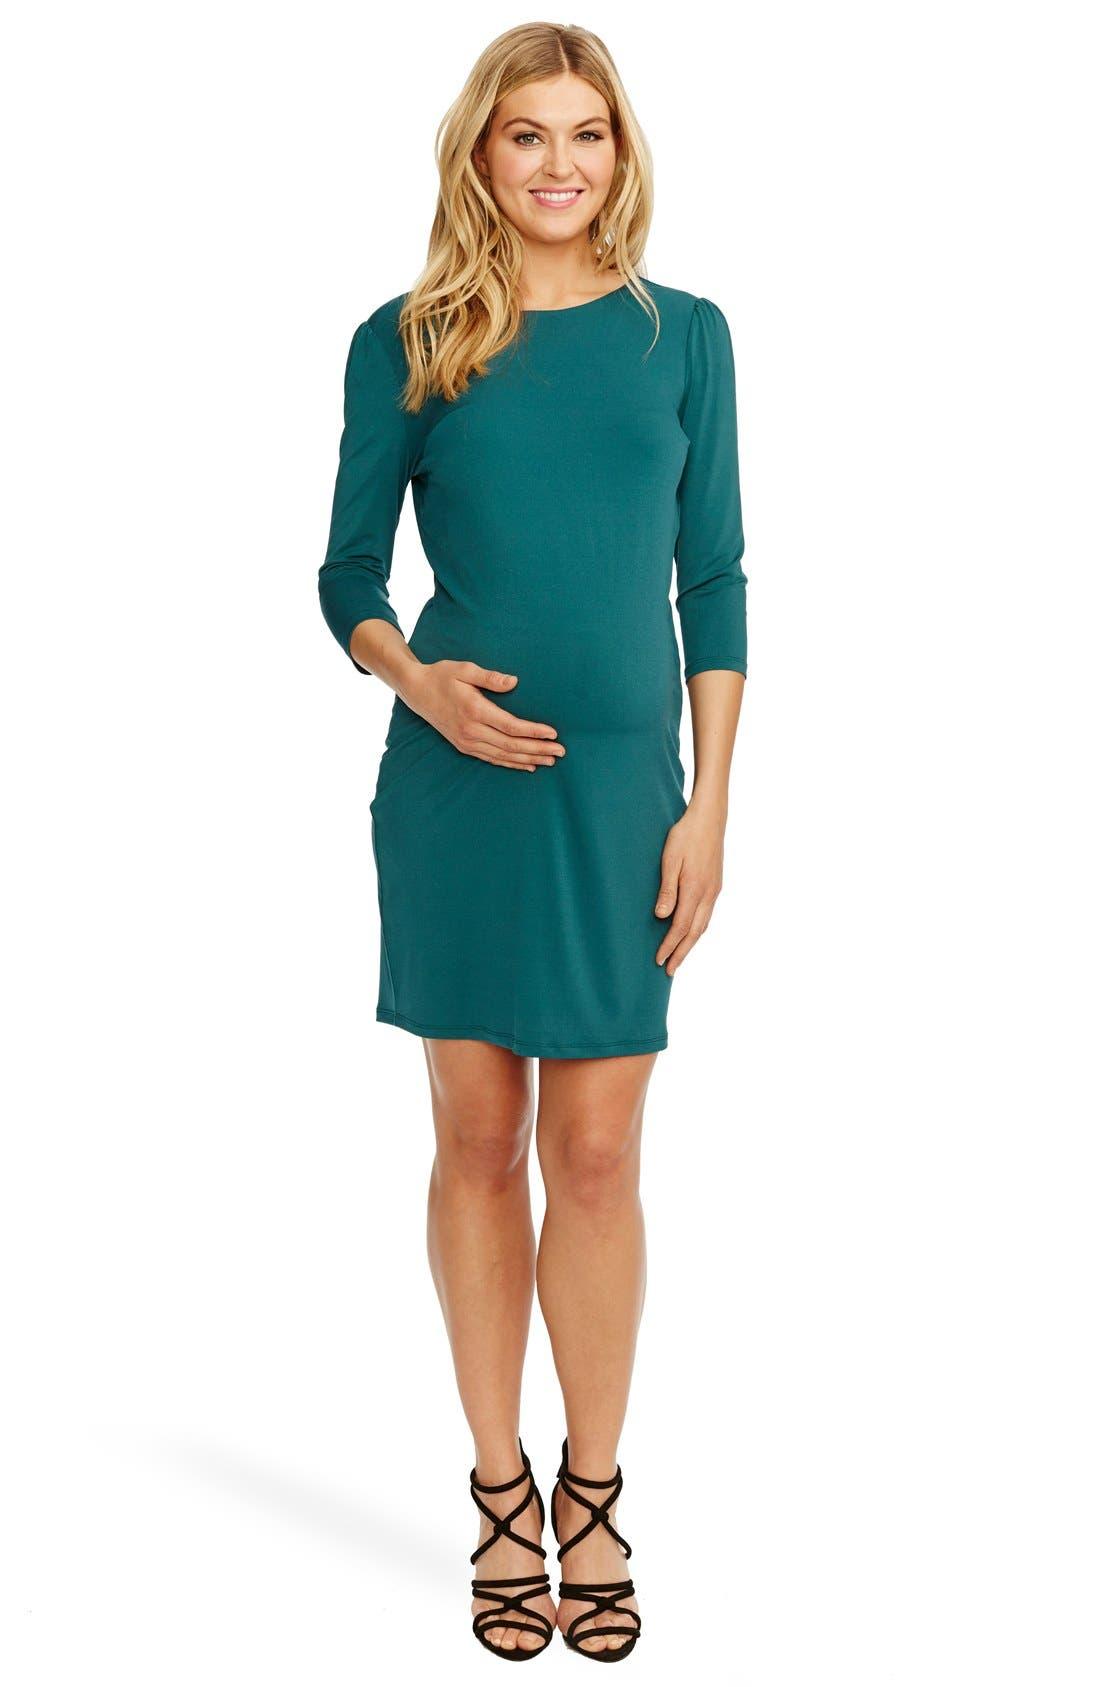 'Audra' Maternity Dress,                             Alternate thumbnail 3, color,                             401